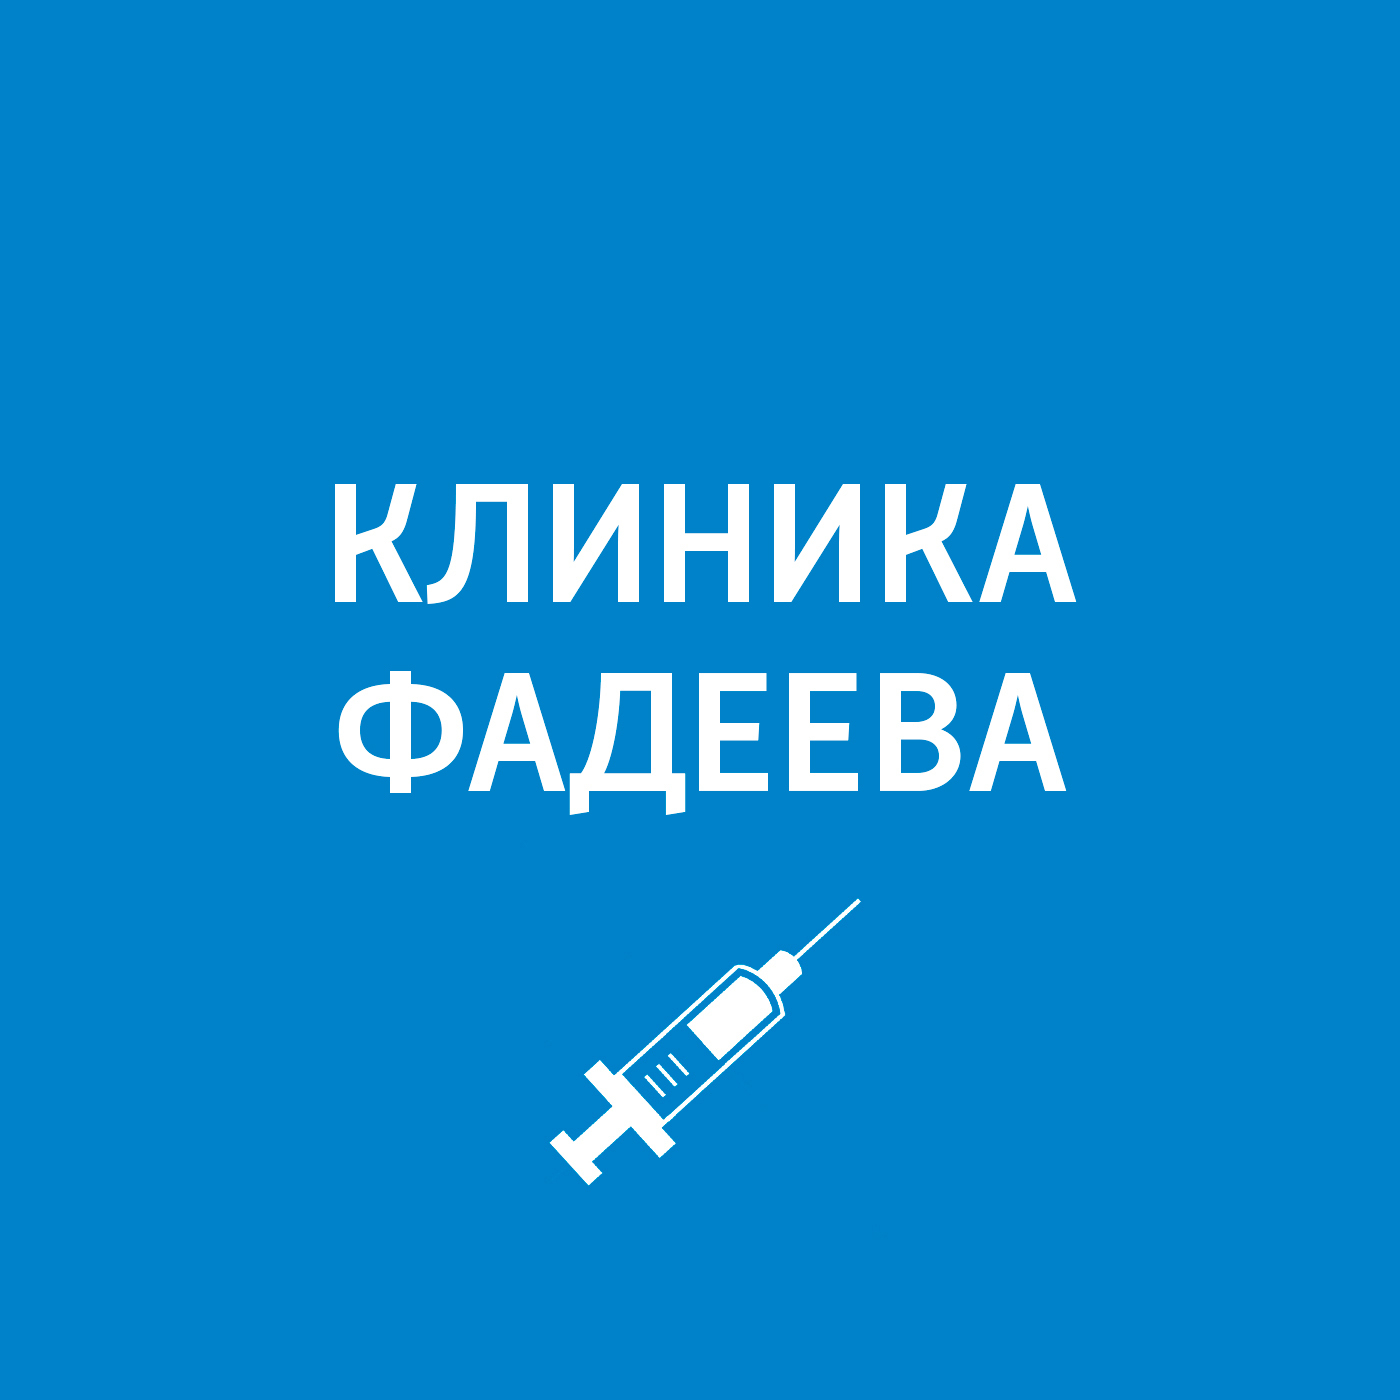 Пётр Фадеев Врач-хирург пляцковский м ребятам о зверятах